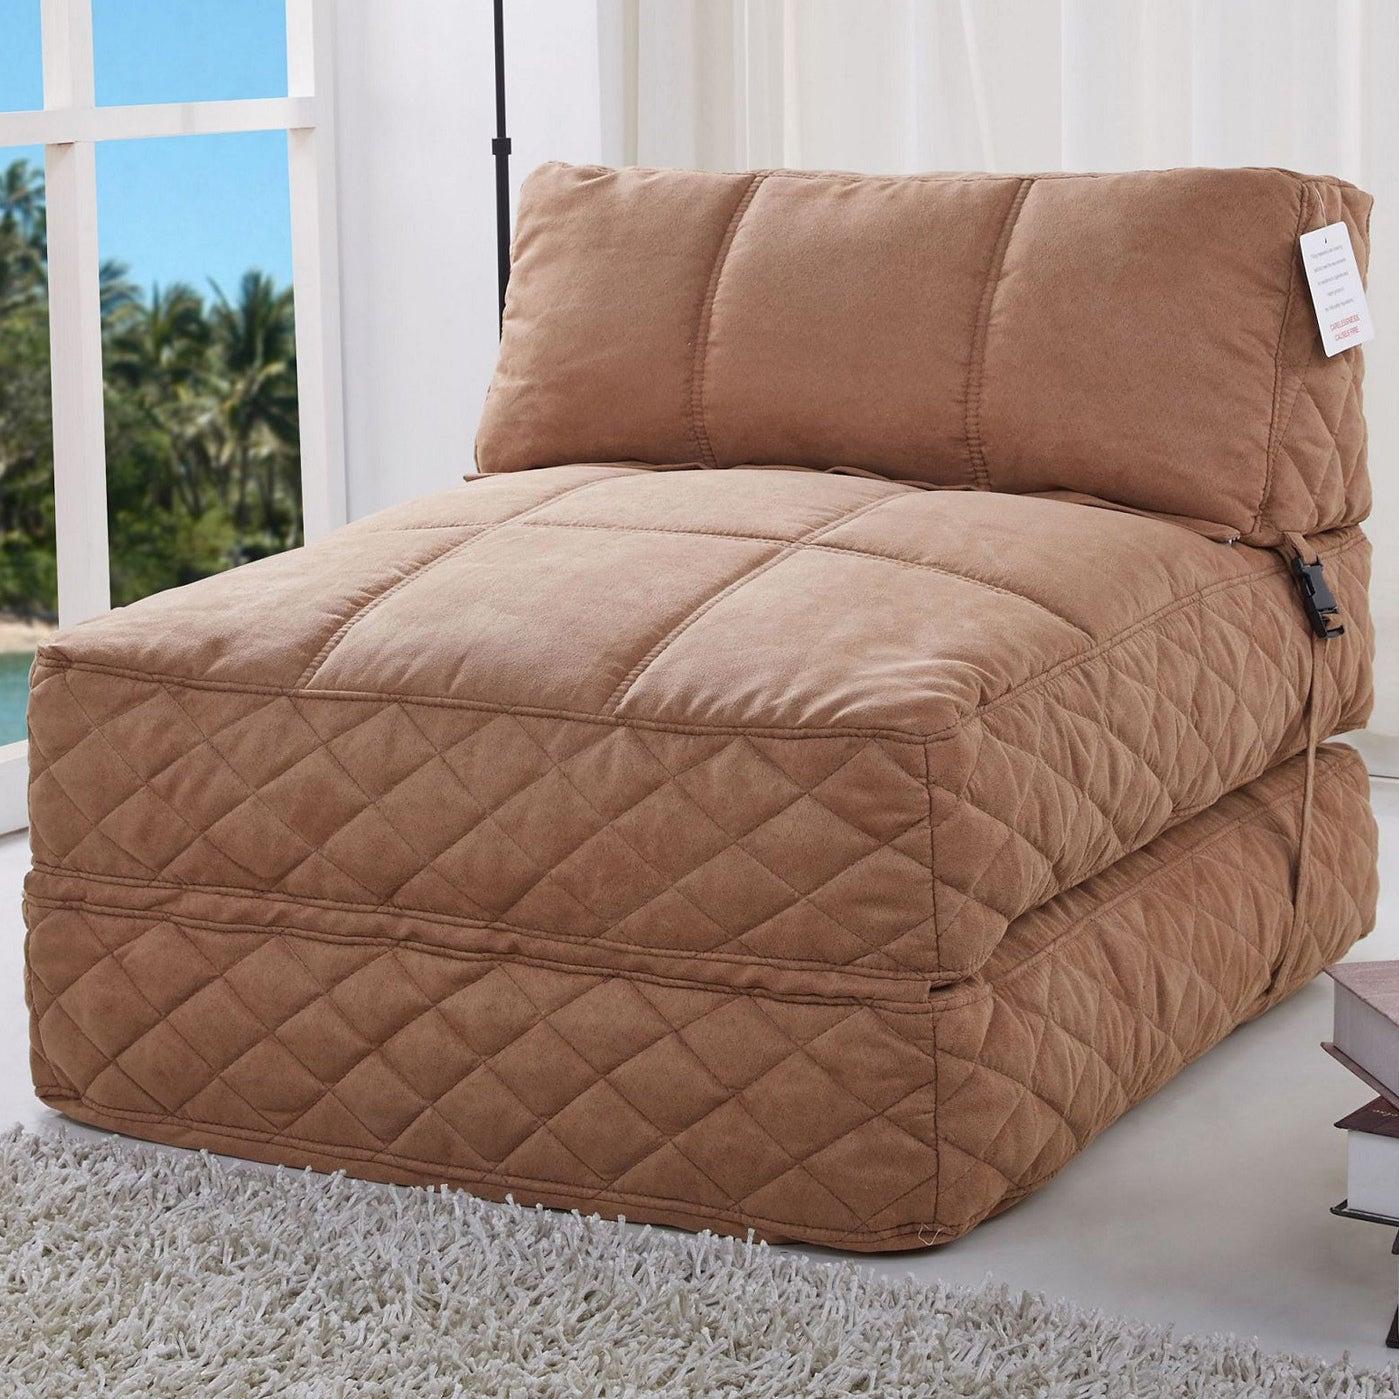 store full austin futon com multiple colors mattress size futons ip walmart